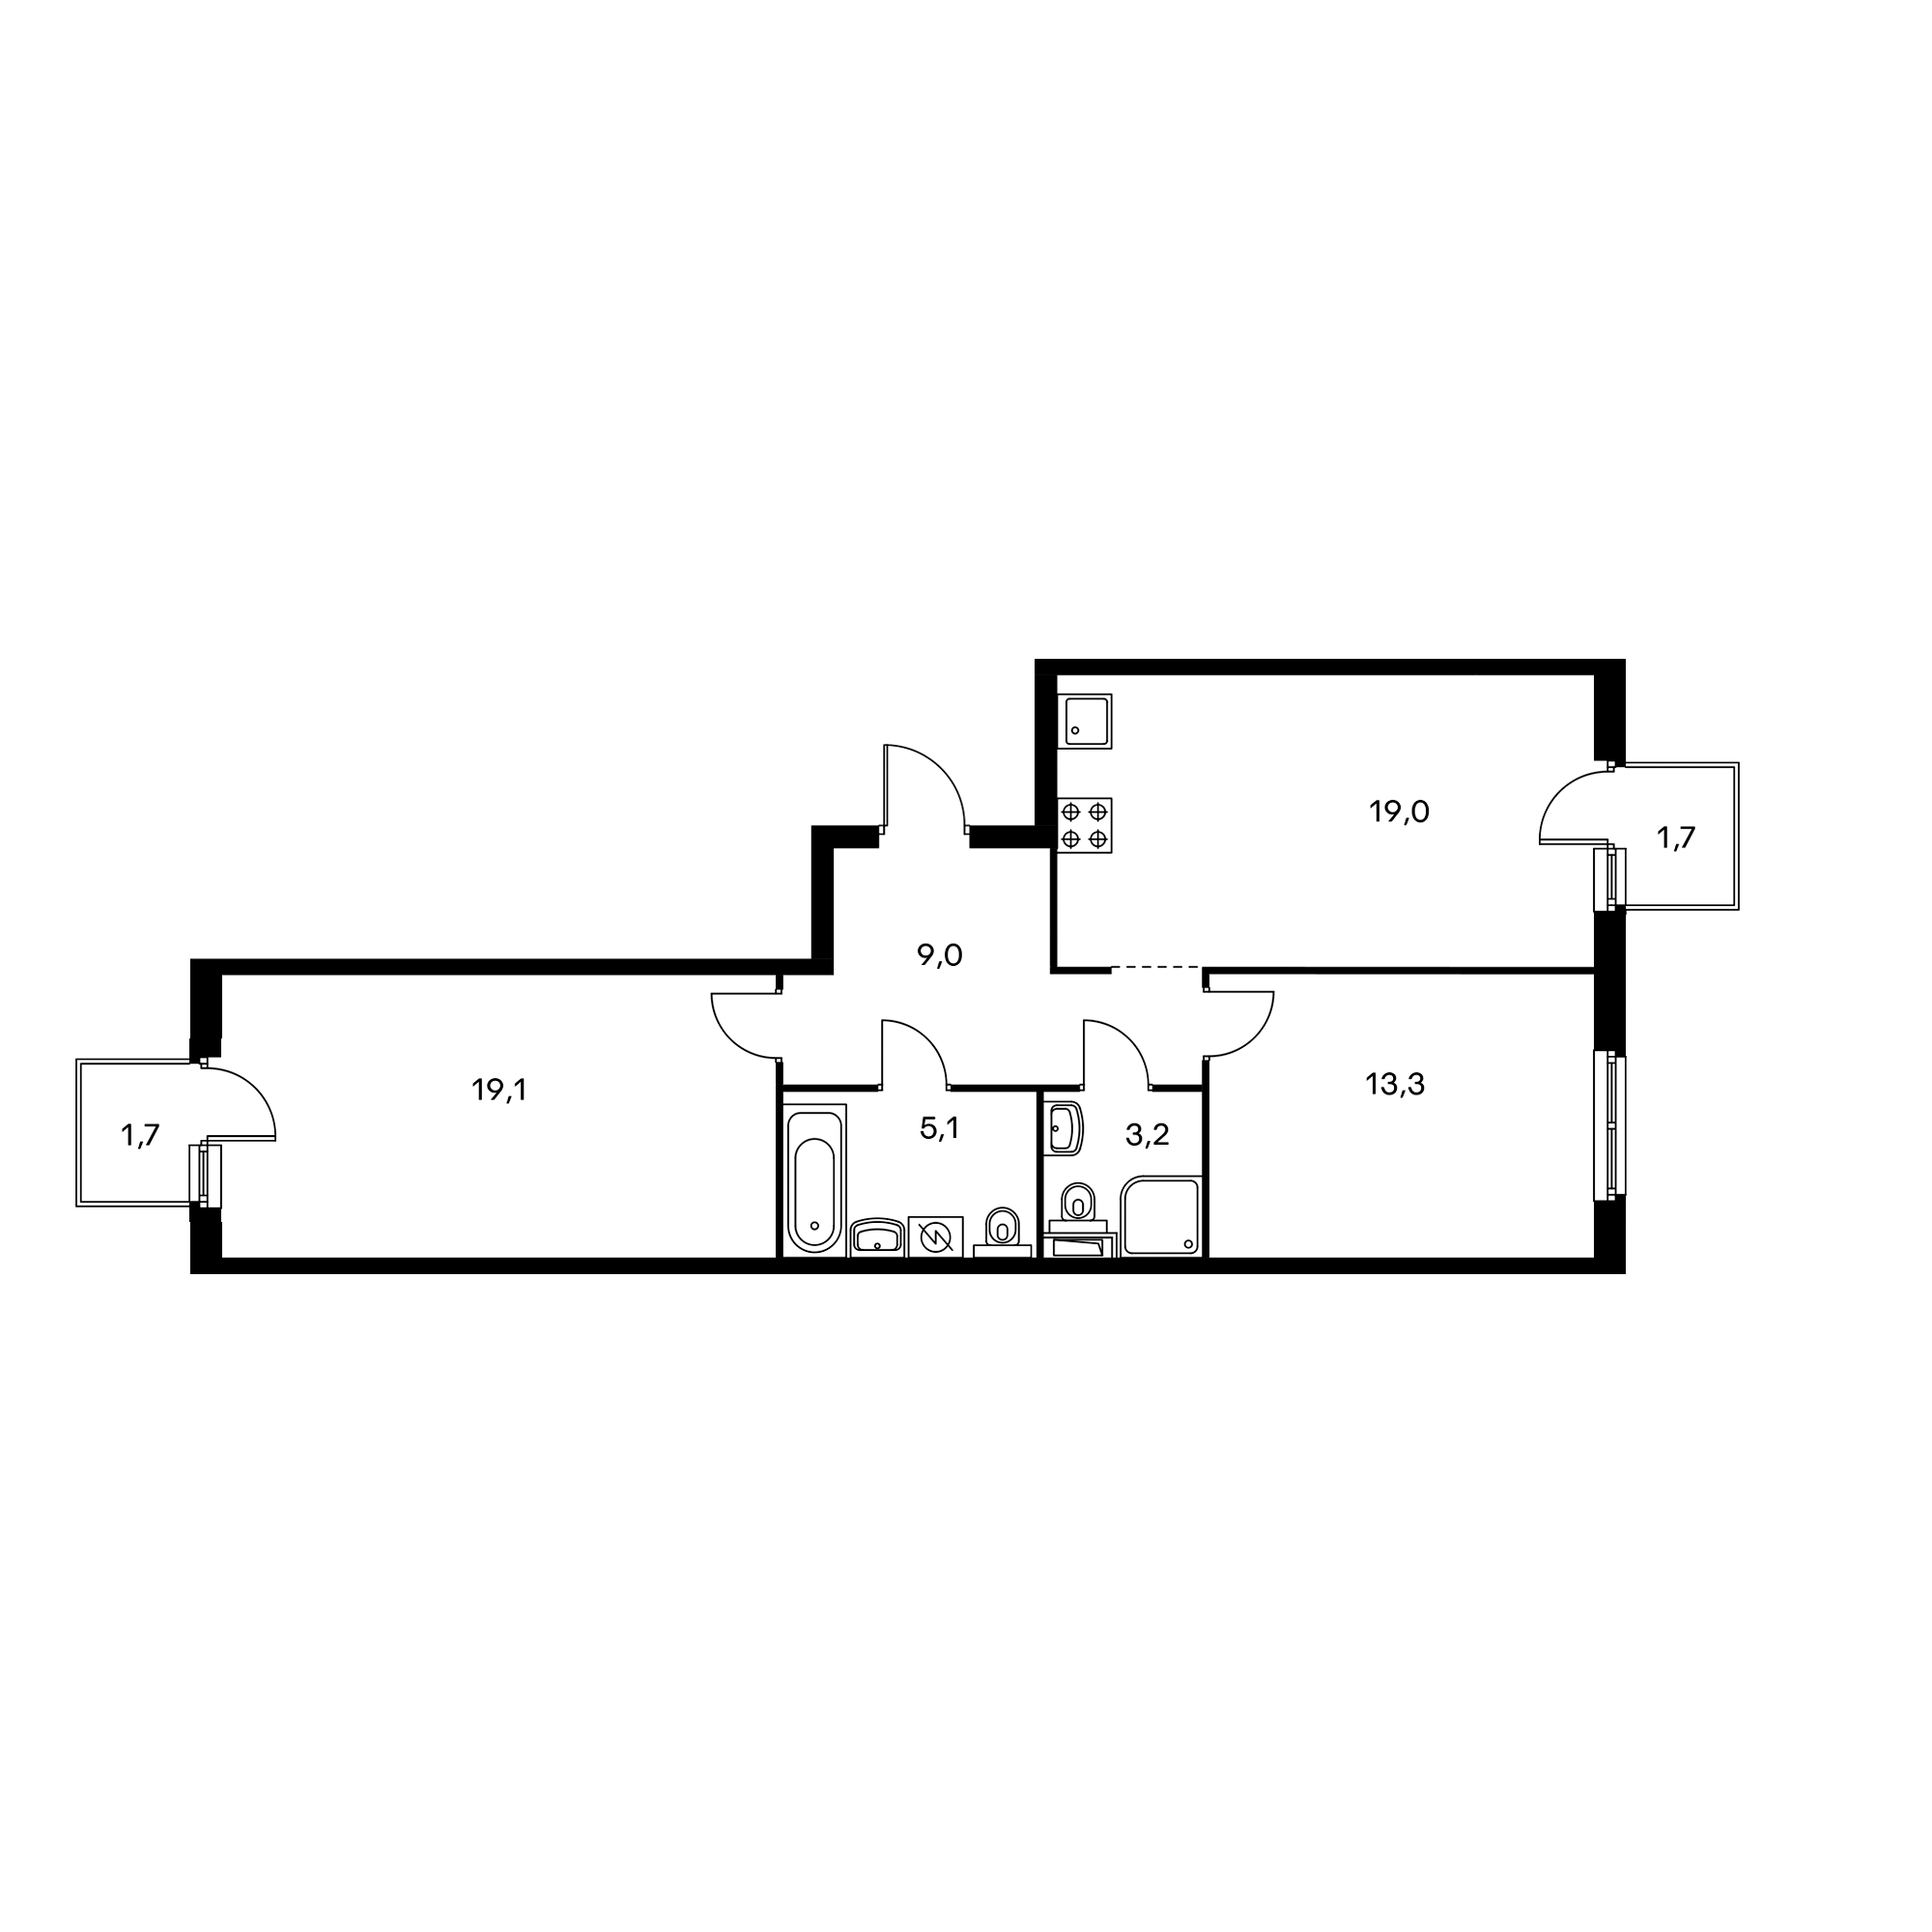 2EL3_6.6-TB2